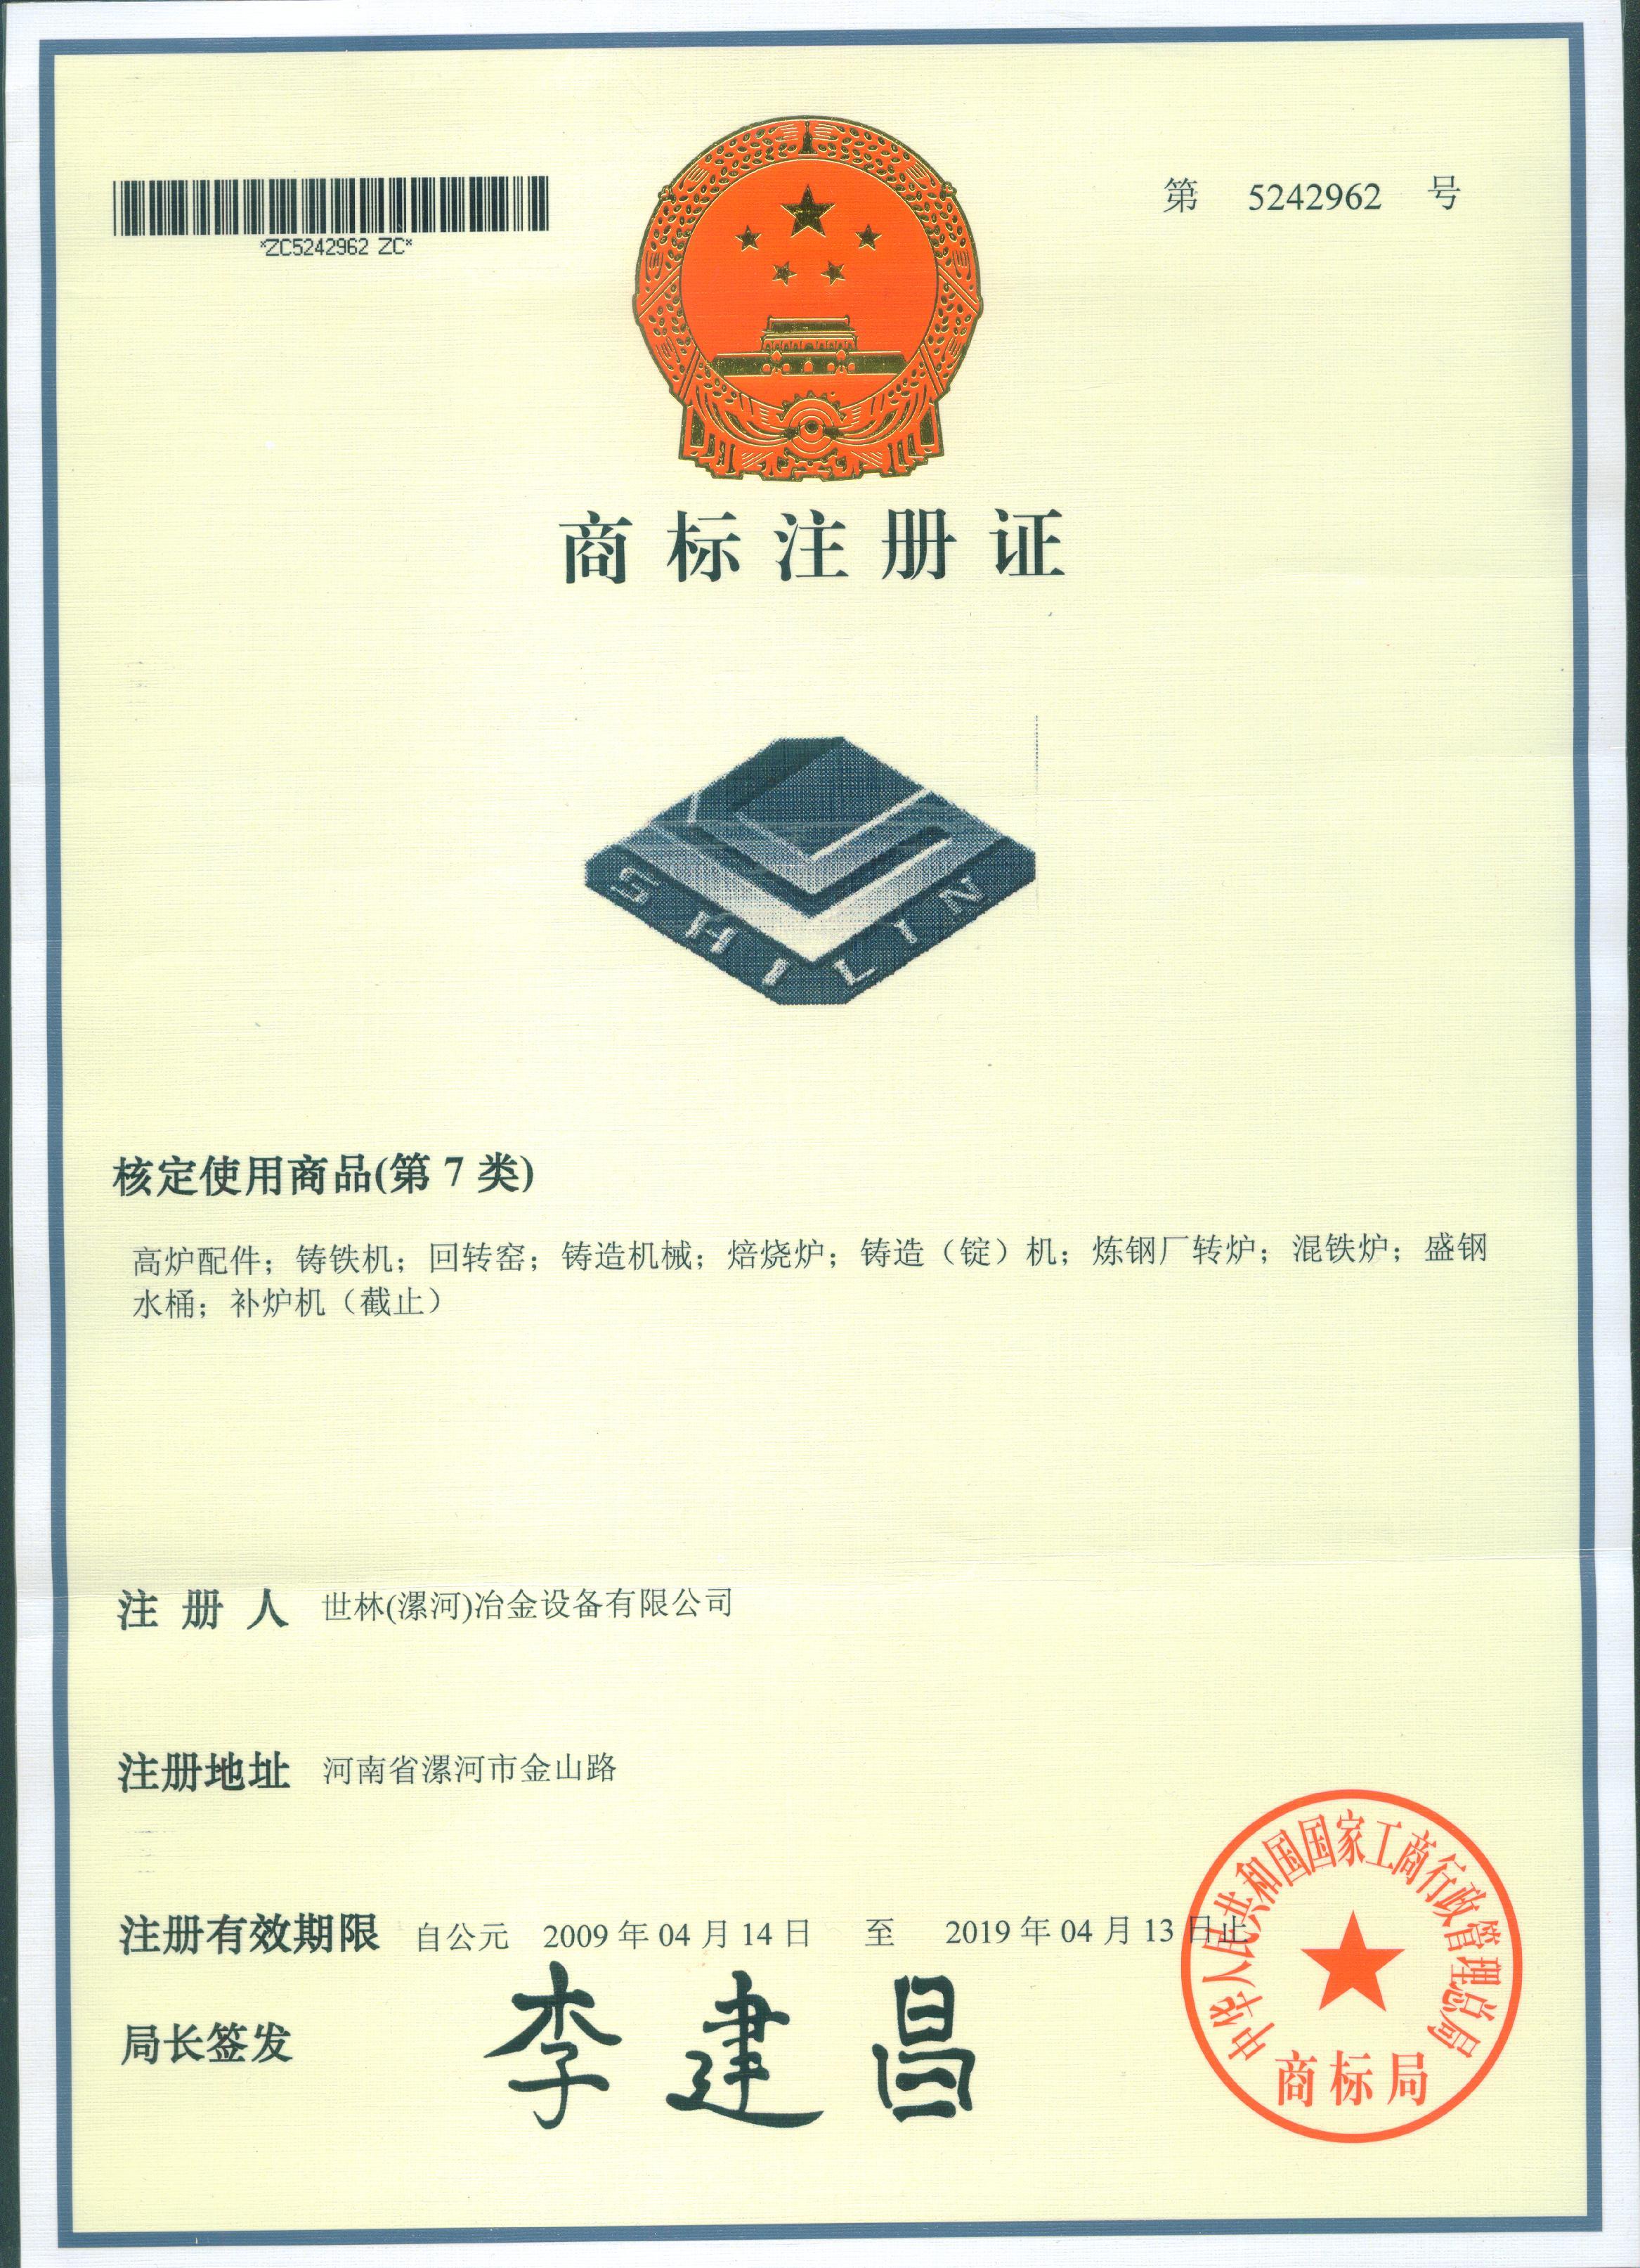 20120224071118699